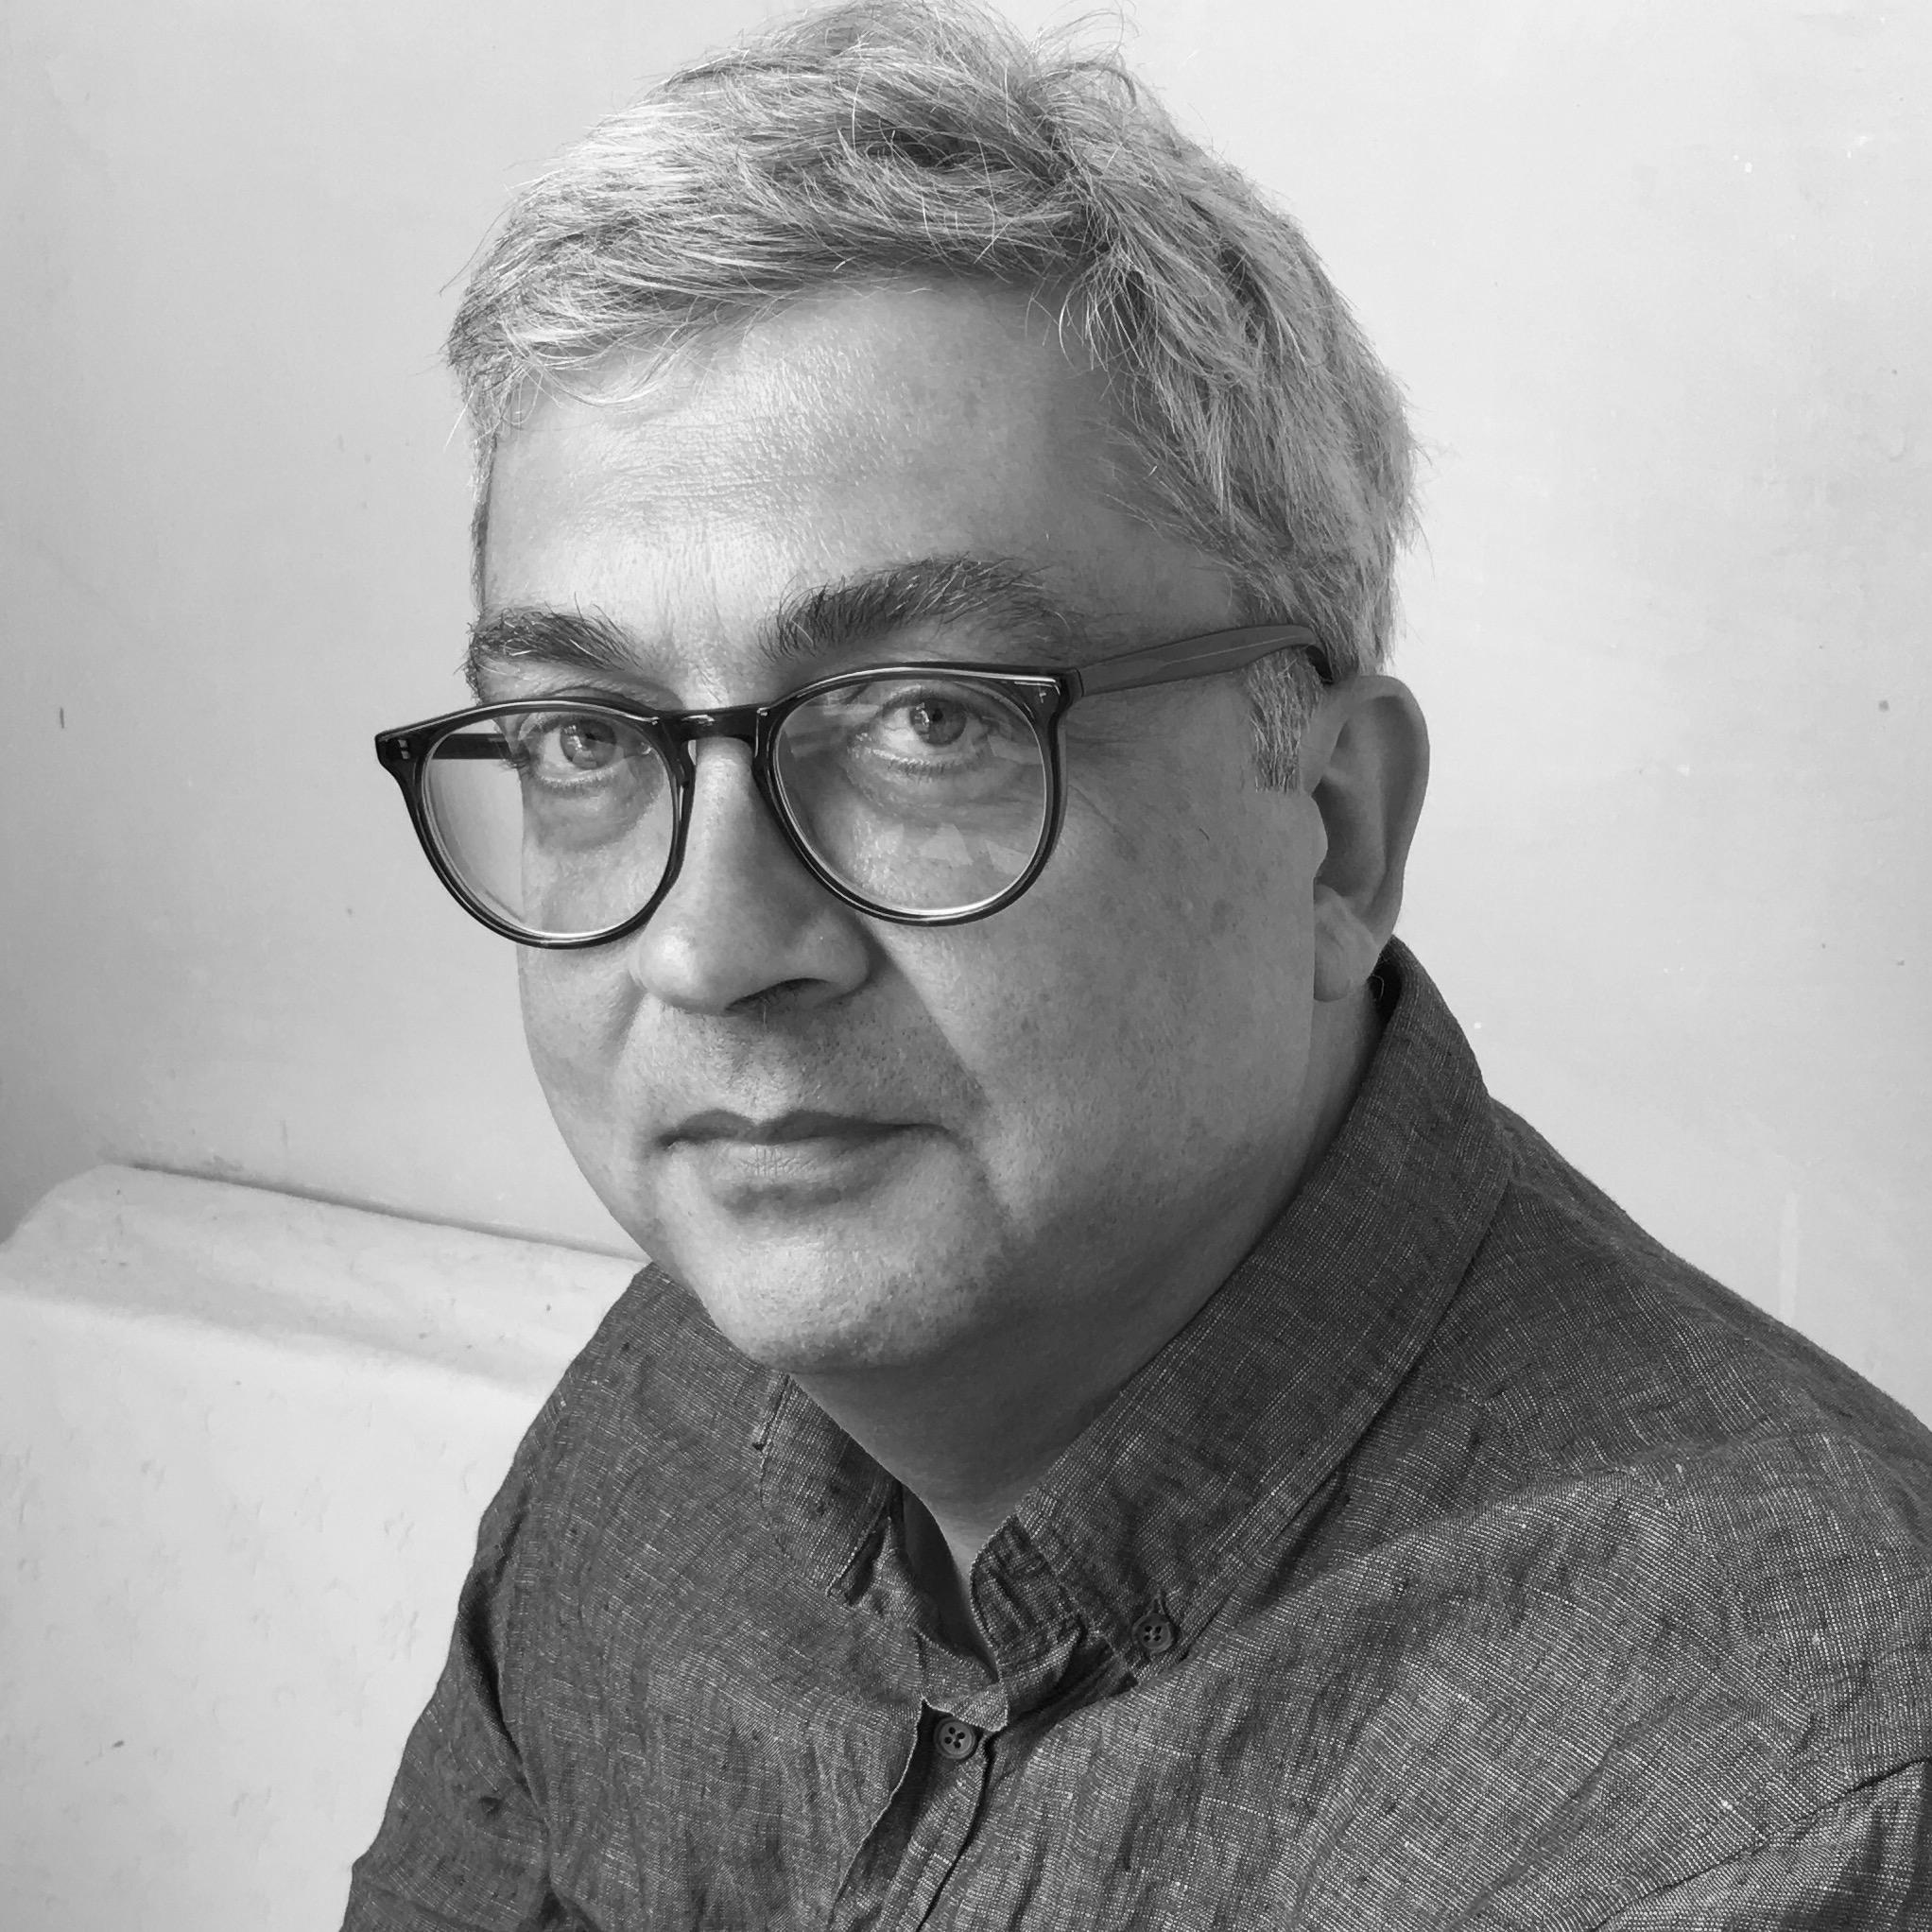 François-Eric Grodin